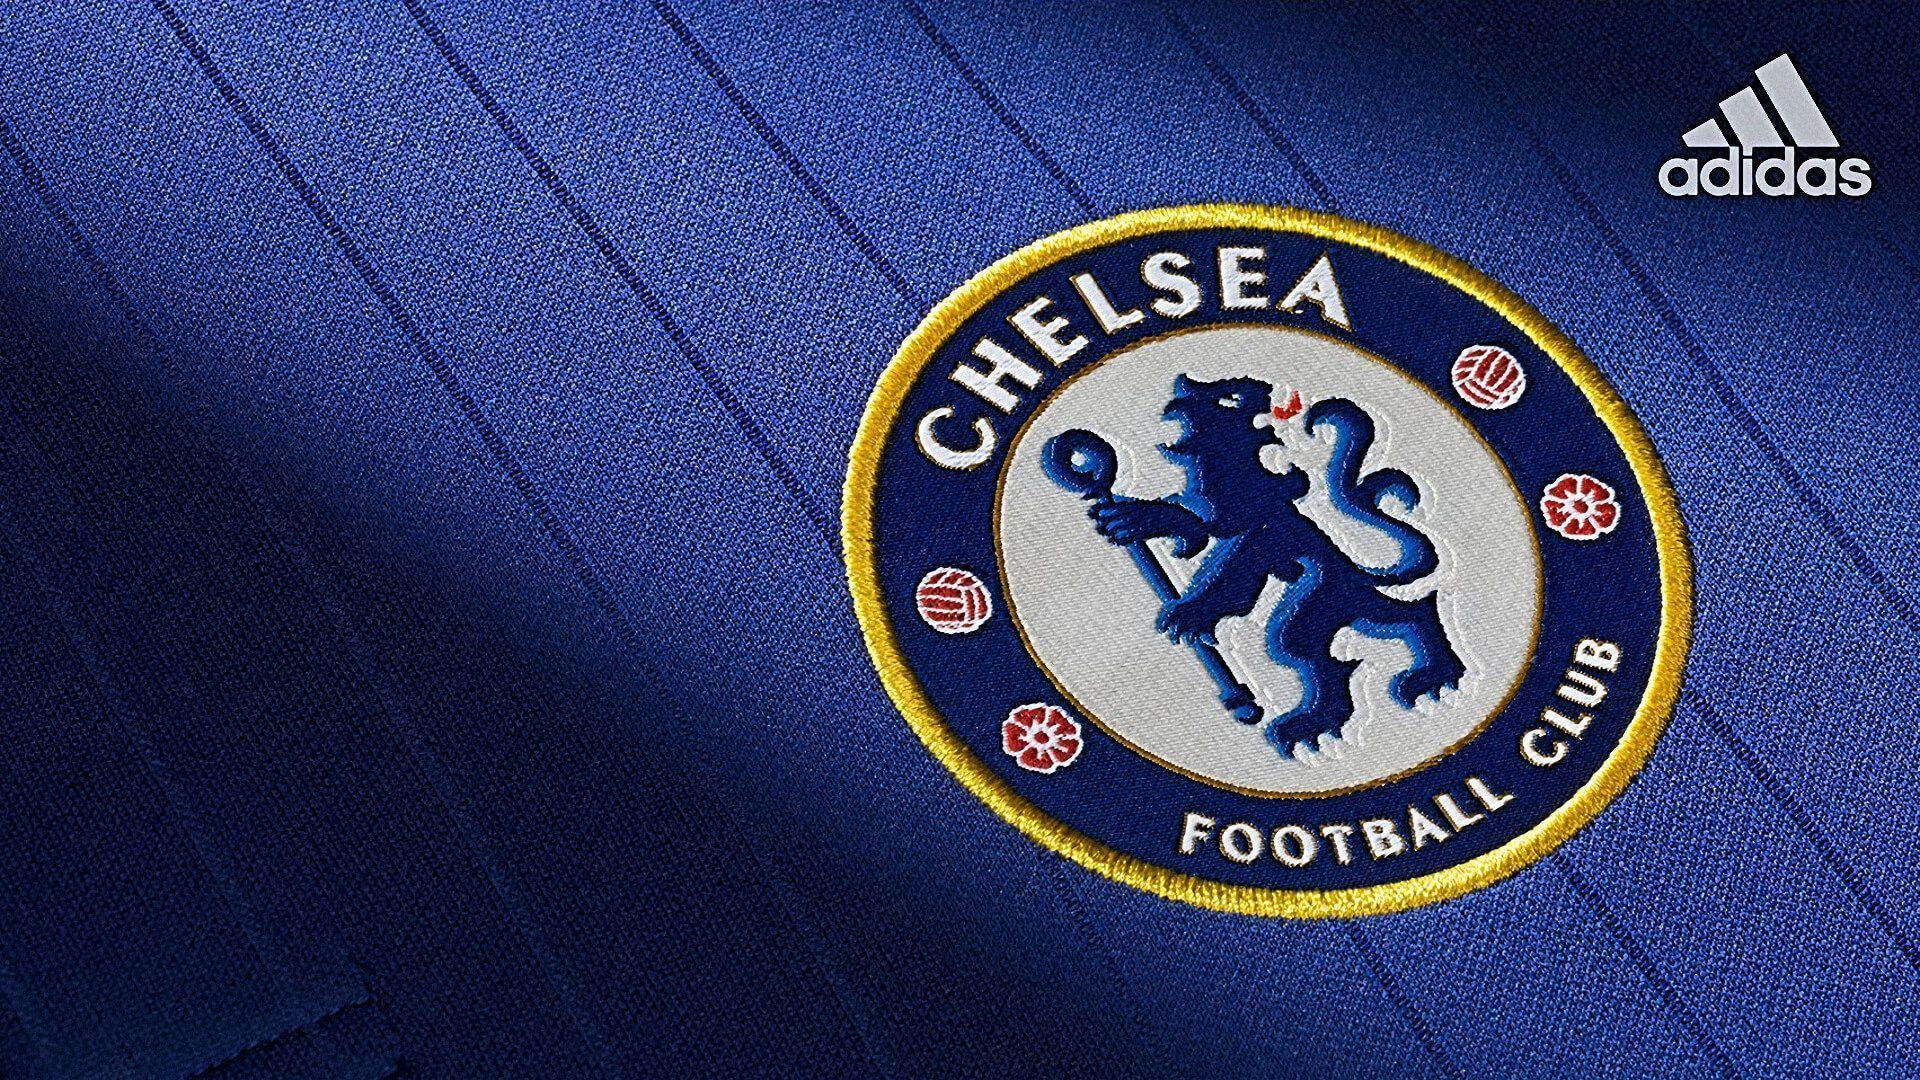 Chelsea HD Wallpapers